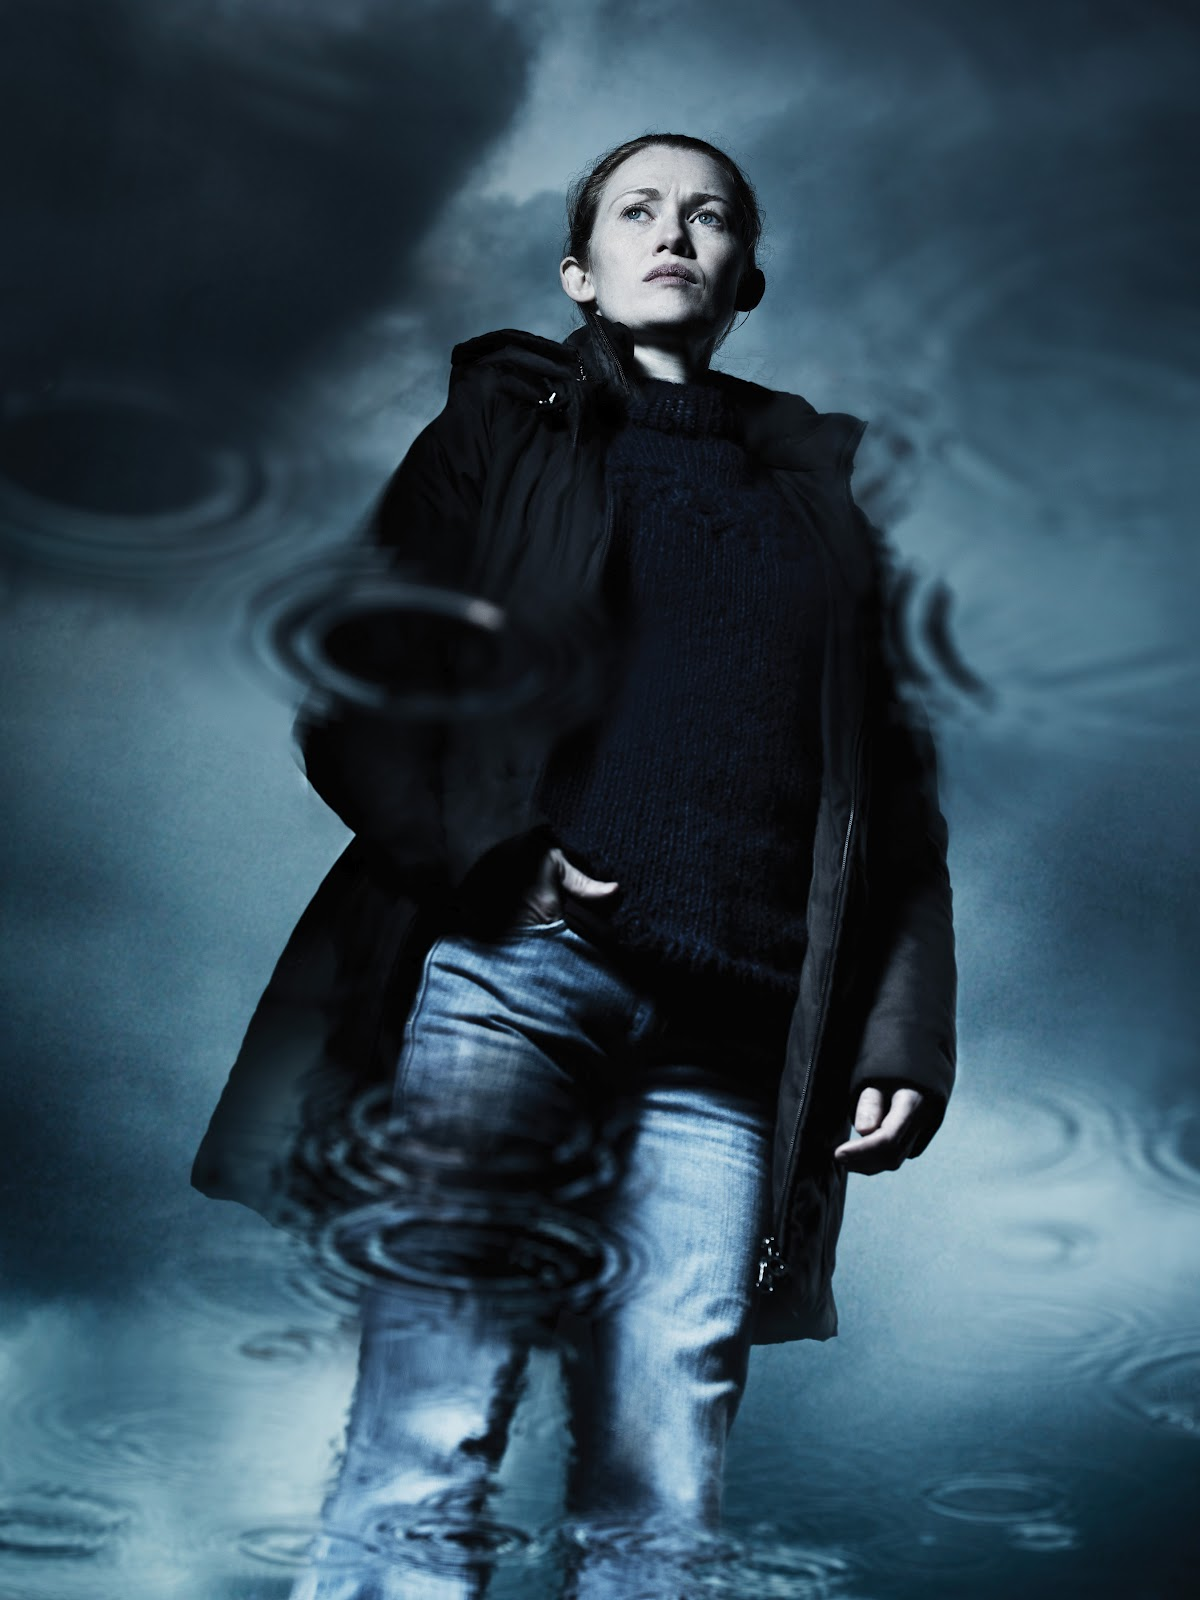 http://3.bp.blogspot.com/-ikg95UexipE/UB7y53OXrOI/AAAAAAAAIJY/eVkqPzdjtA4/s1600/Mireille-Enos-Sarah-Linden-The-Killing.jpg